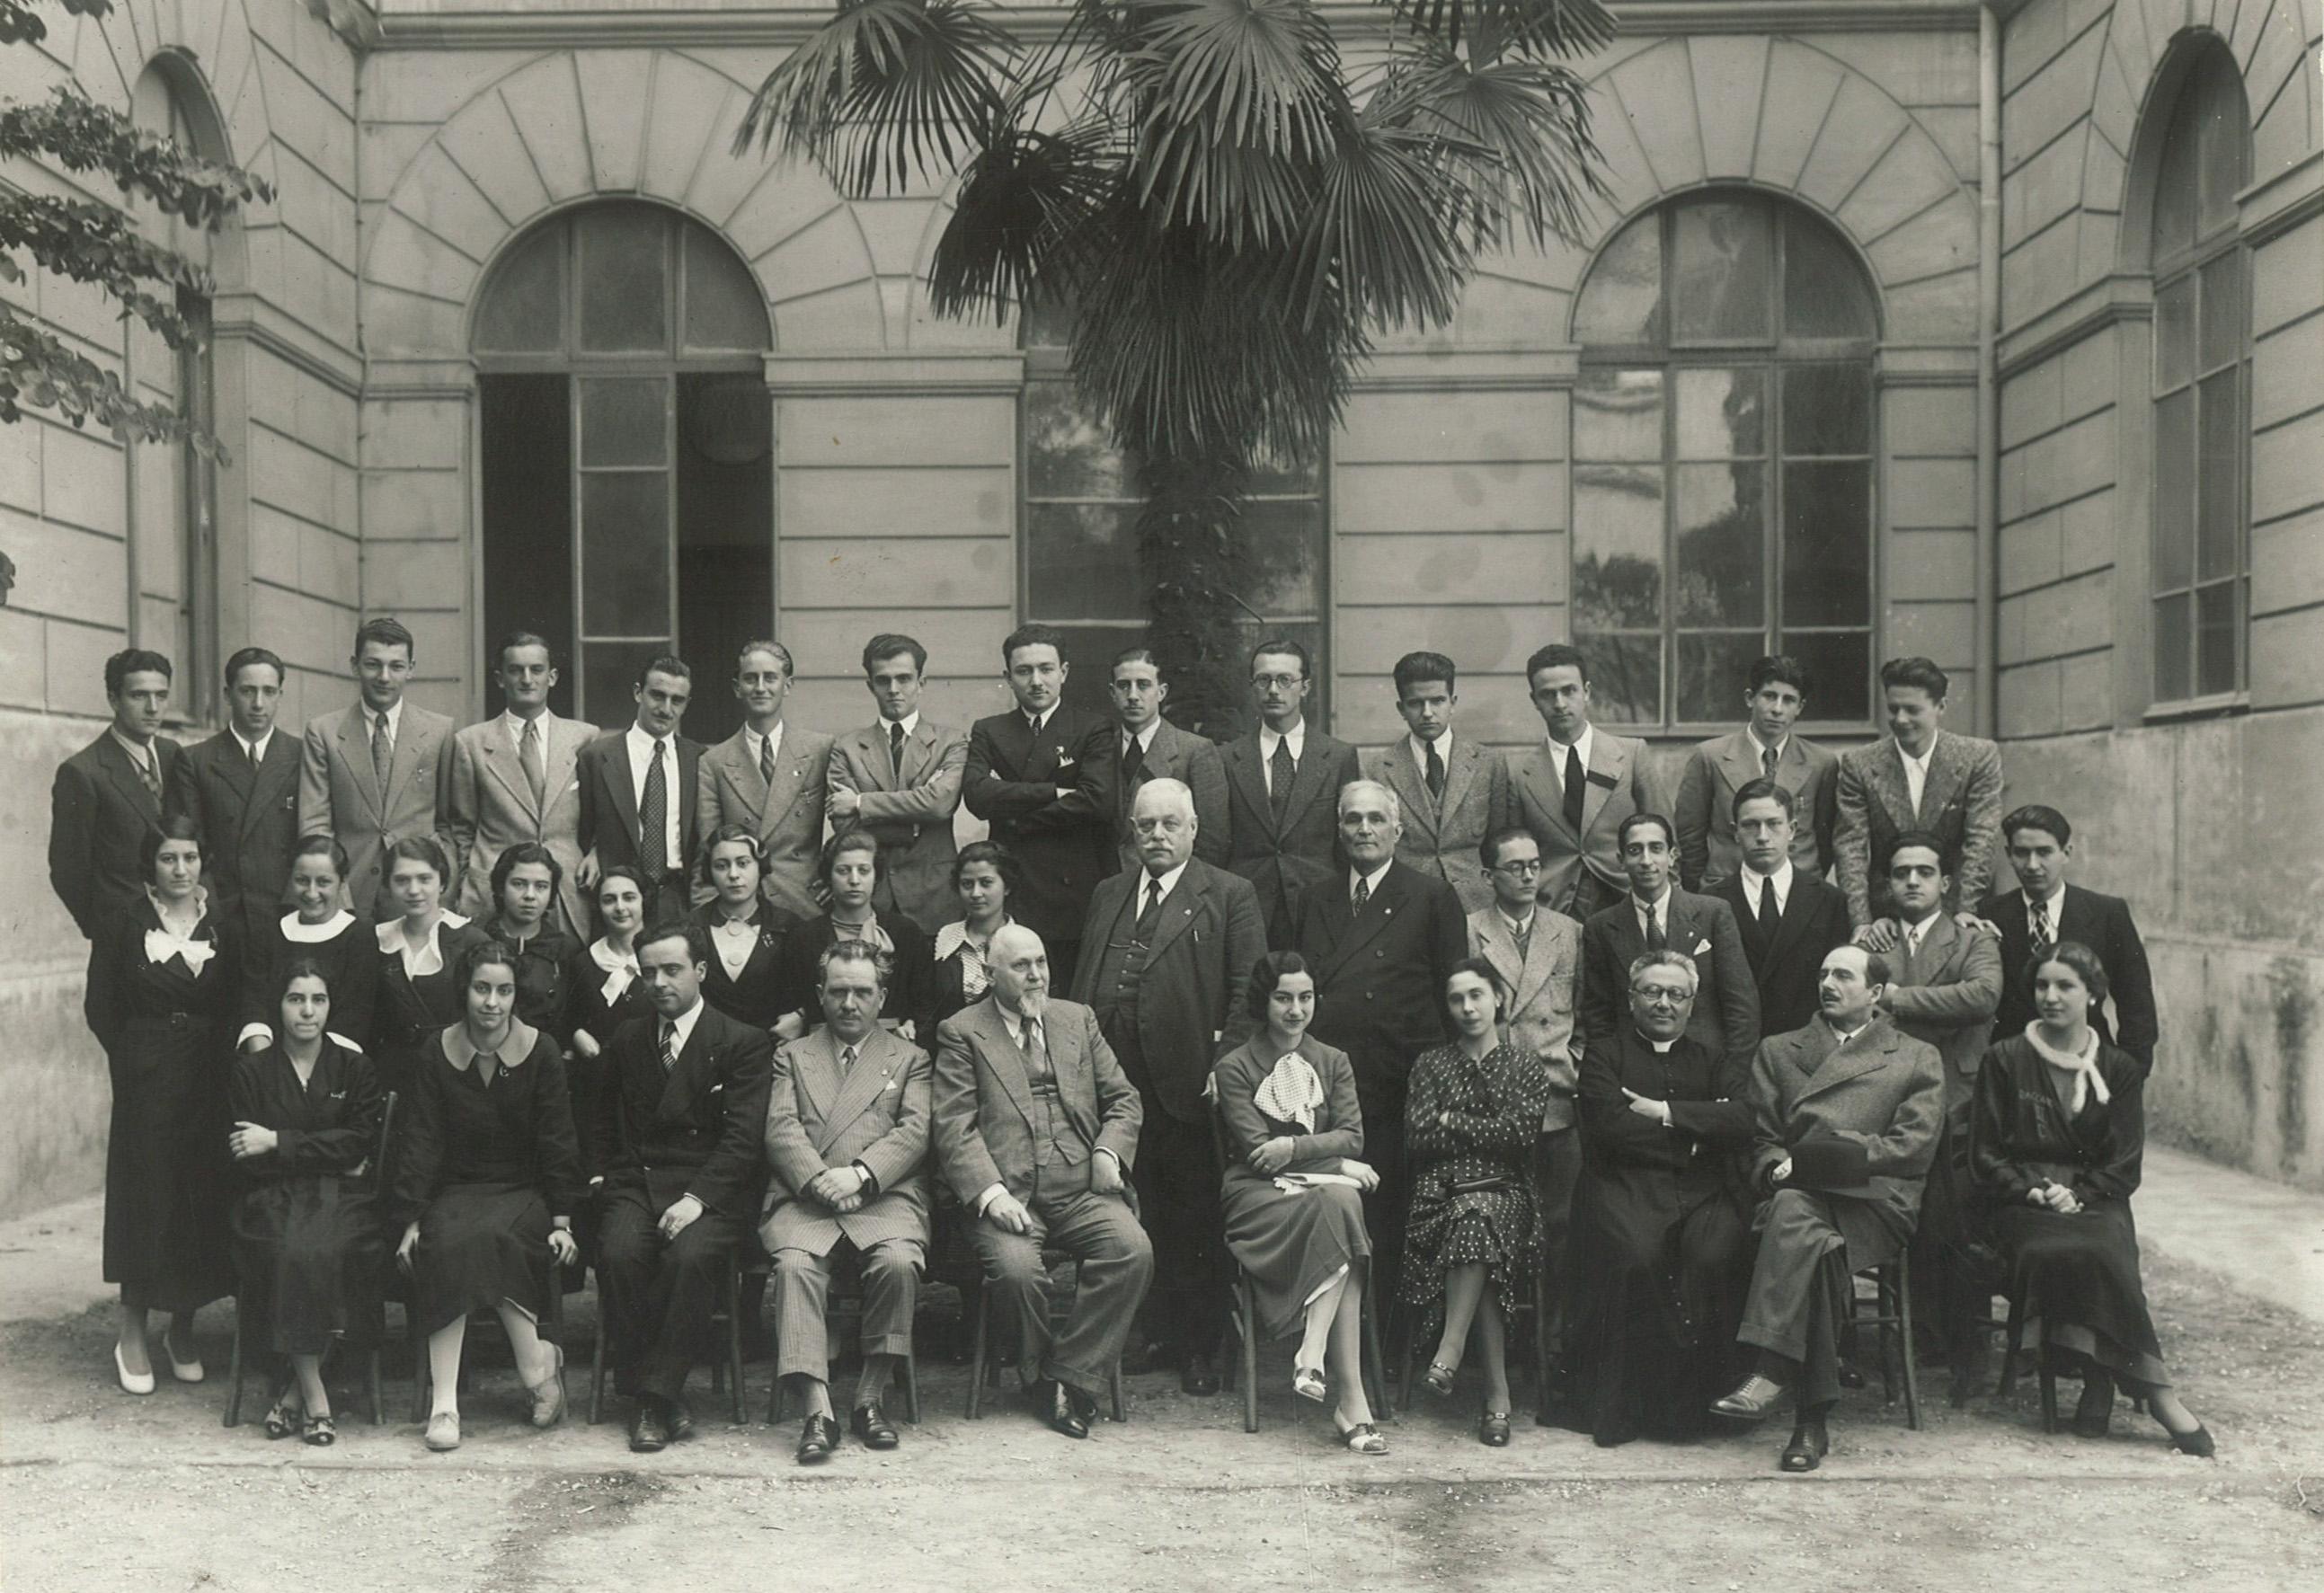 Preside Grossi  1 f  Classe Umberto Serafini